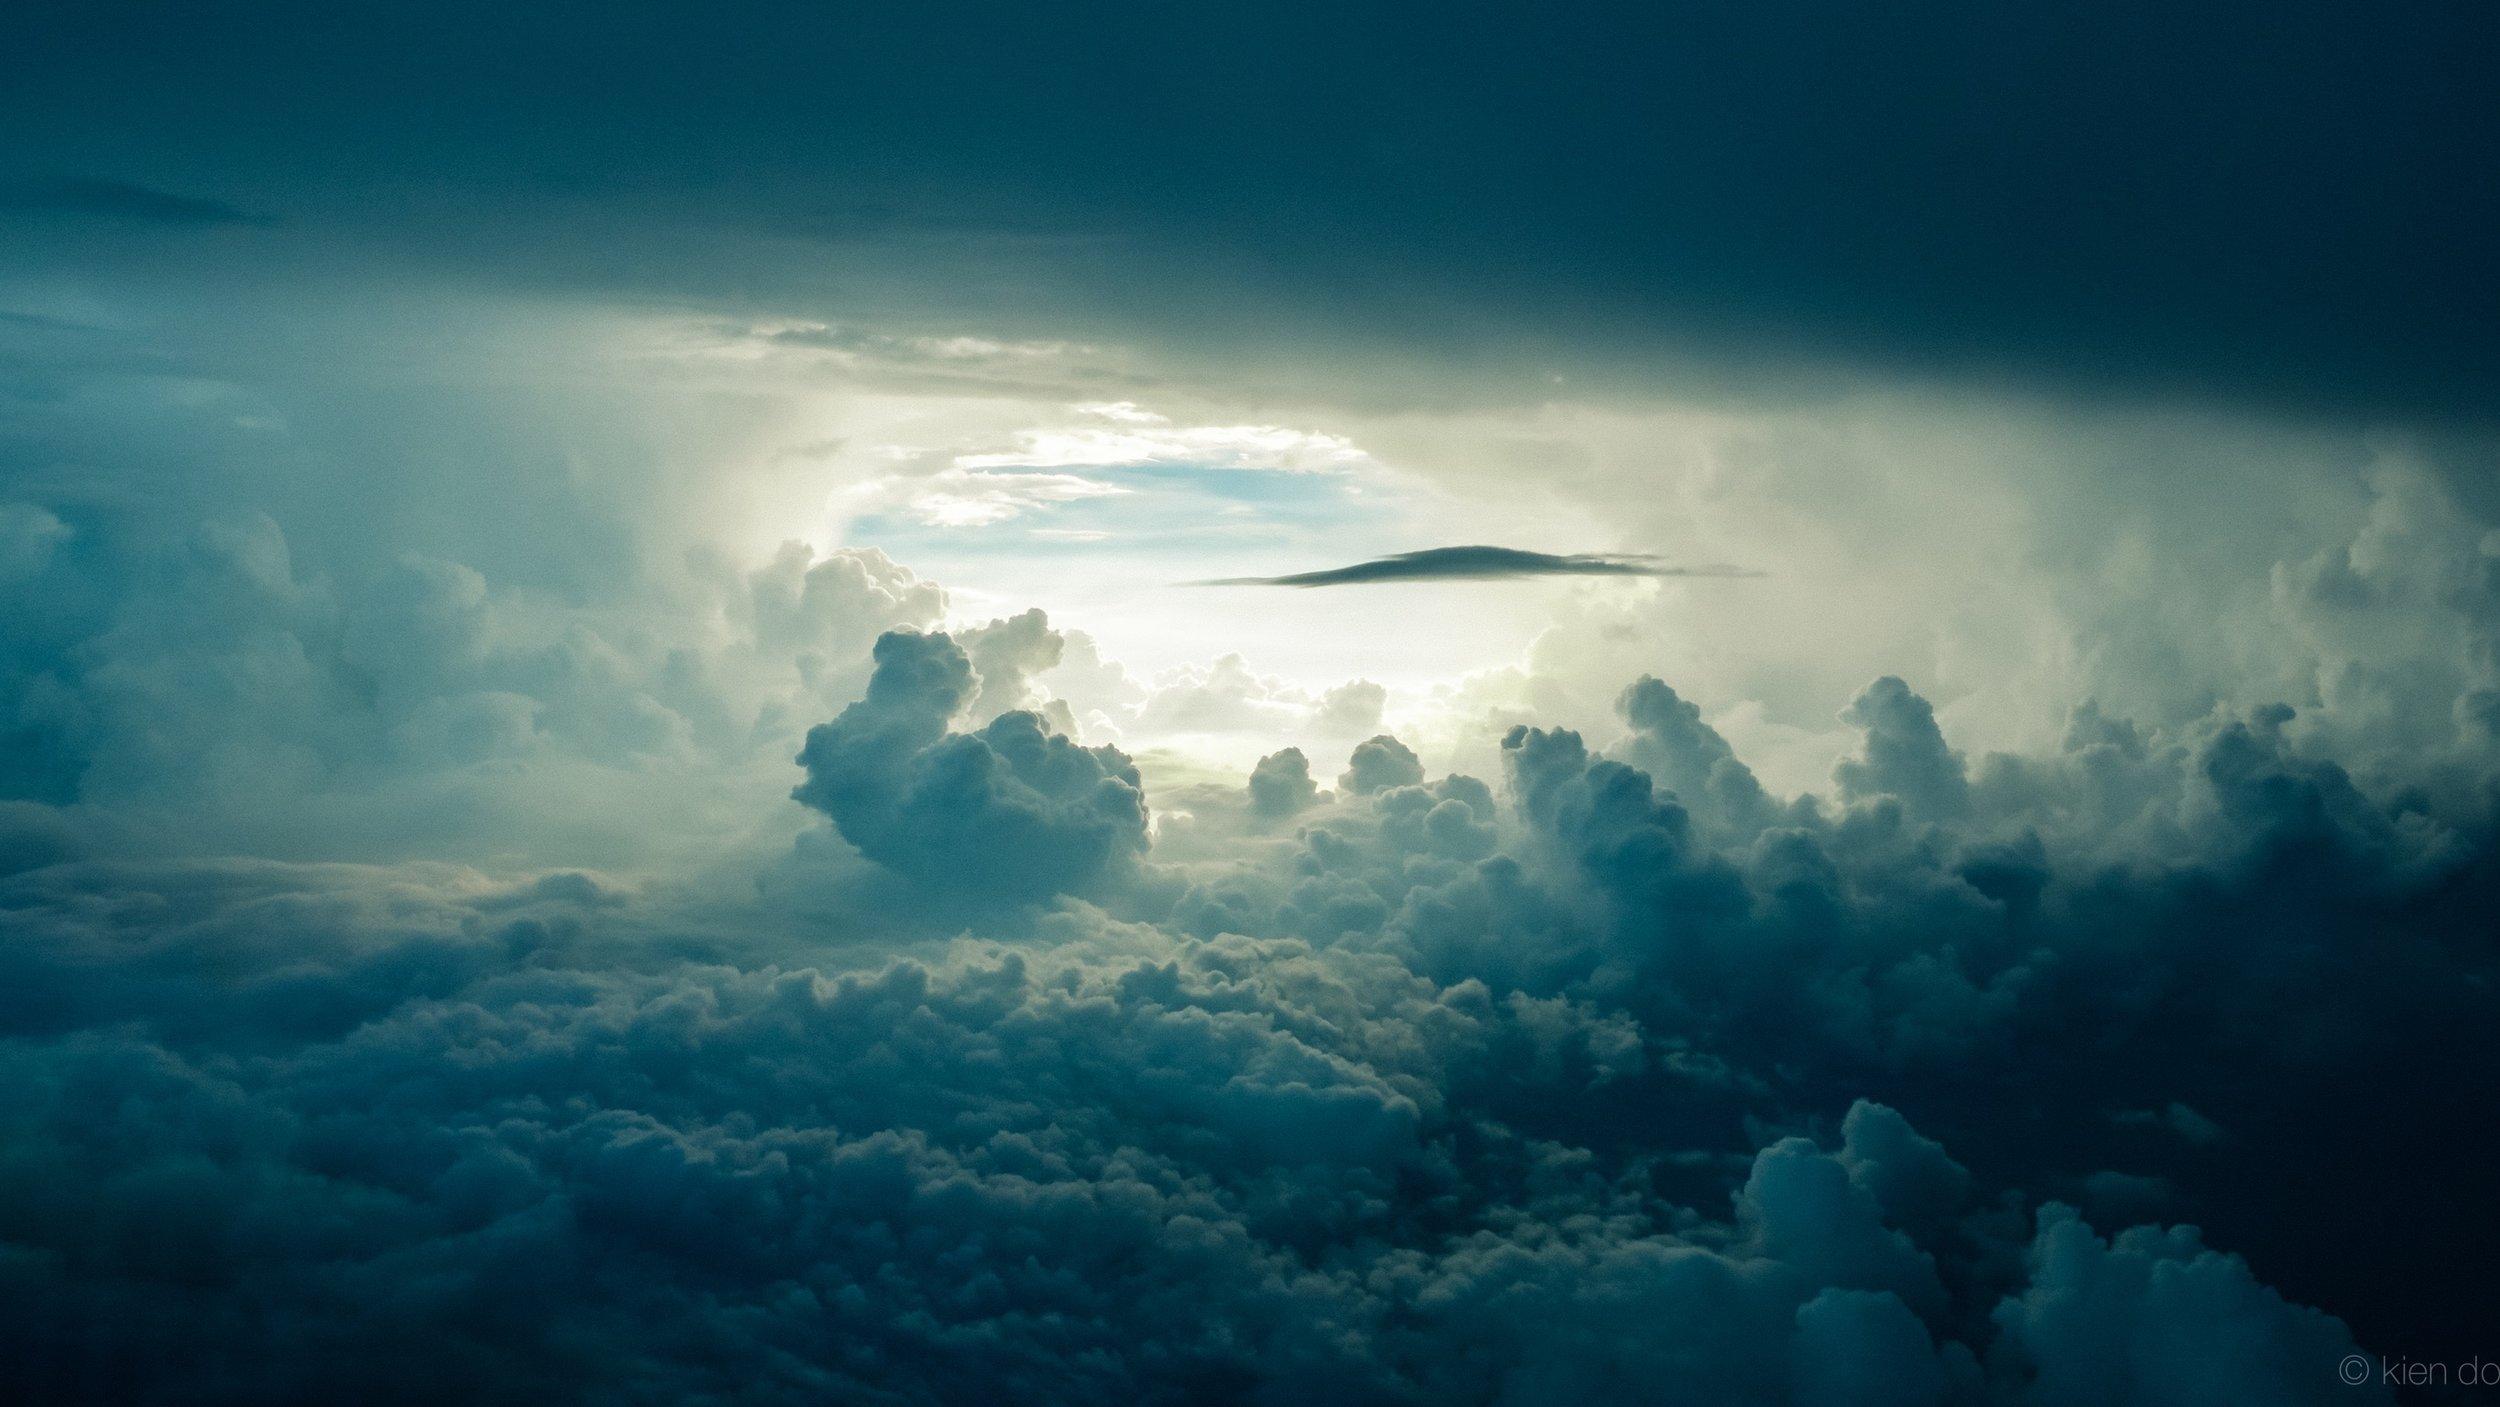 I've been calling it Teal Clouds by  Kien Do.  https://unsplash.com/@kiendo